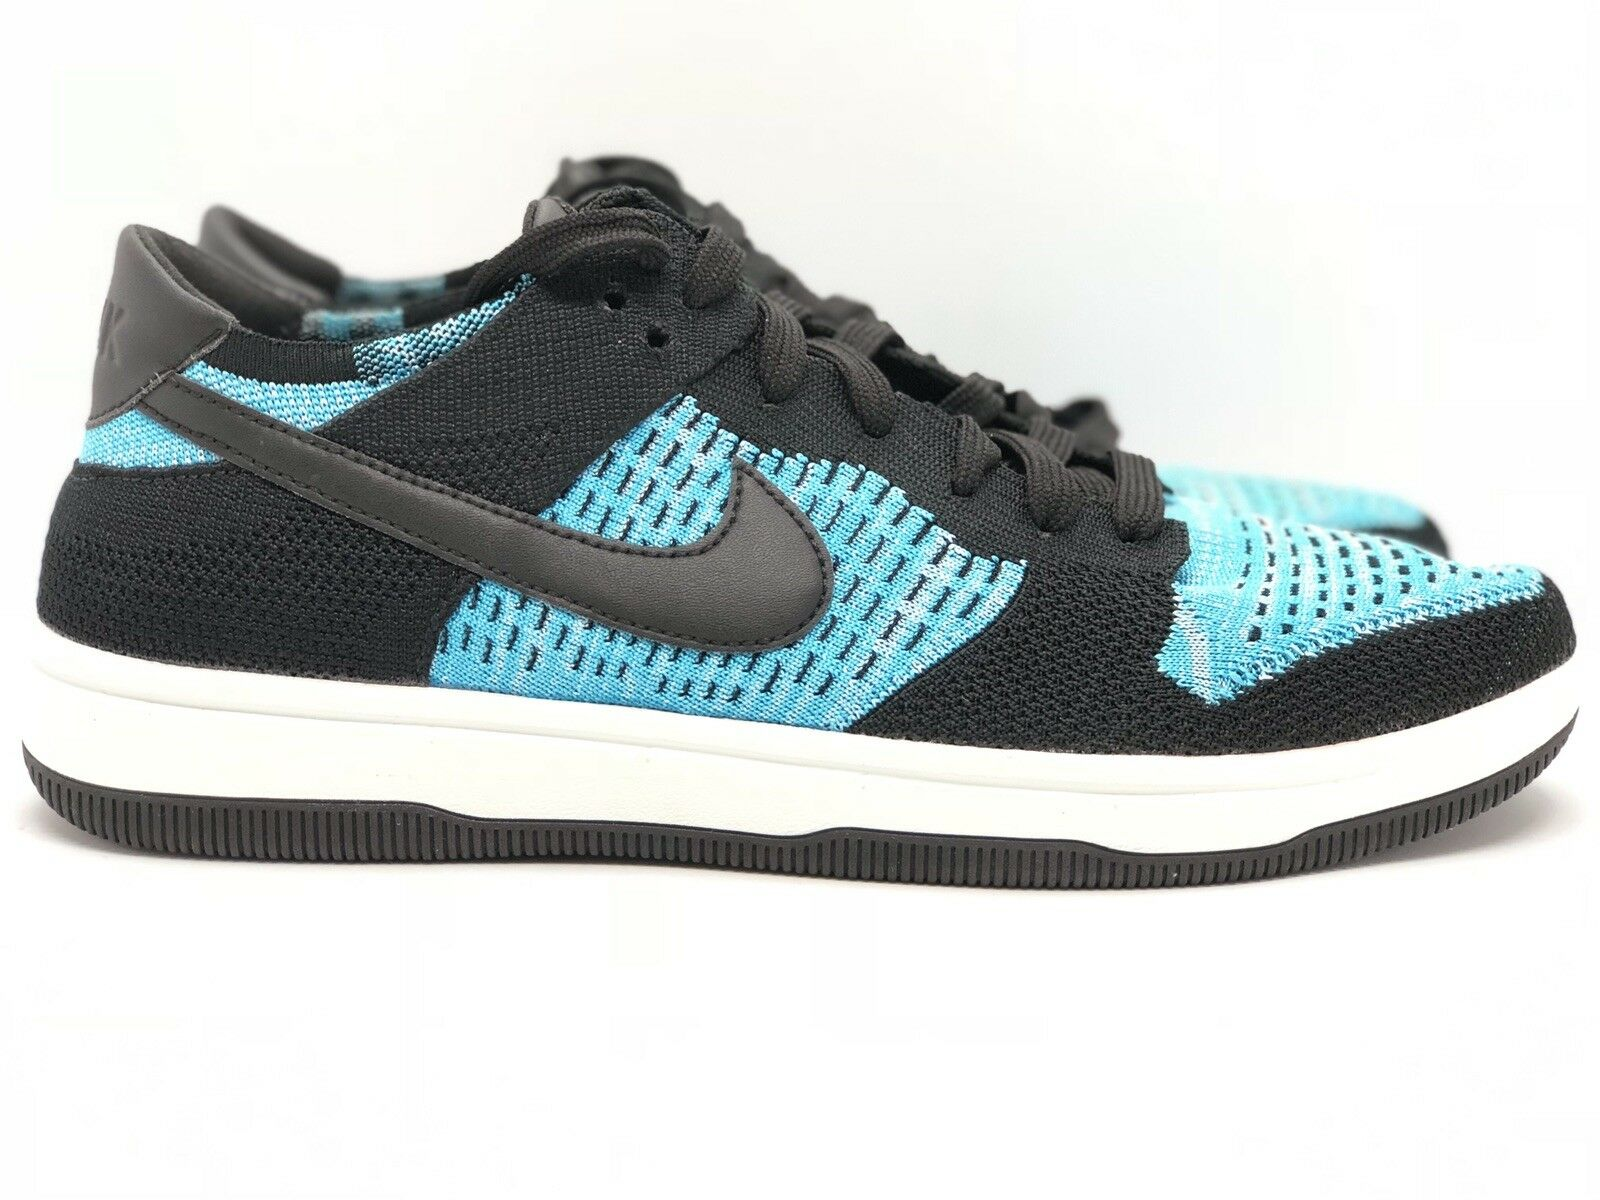 New Nike Dunk Flyknit Black   Chlorine bluee 917746-001 Size 9.5 US